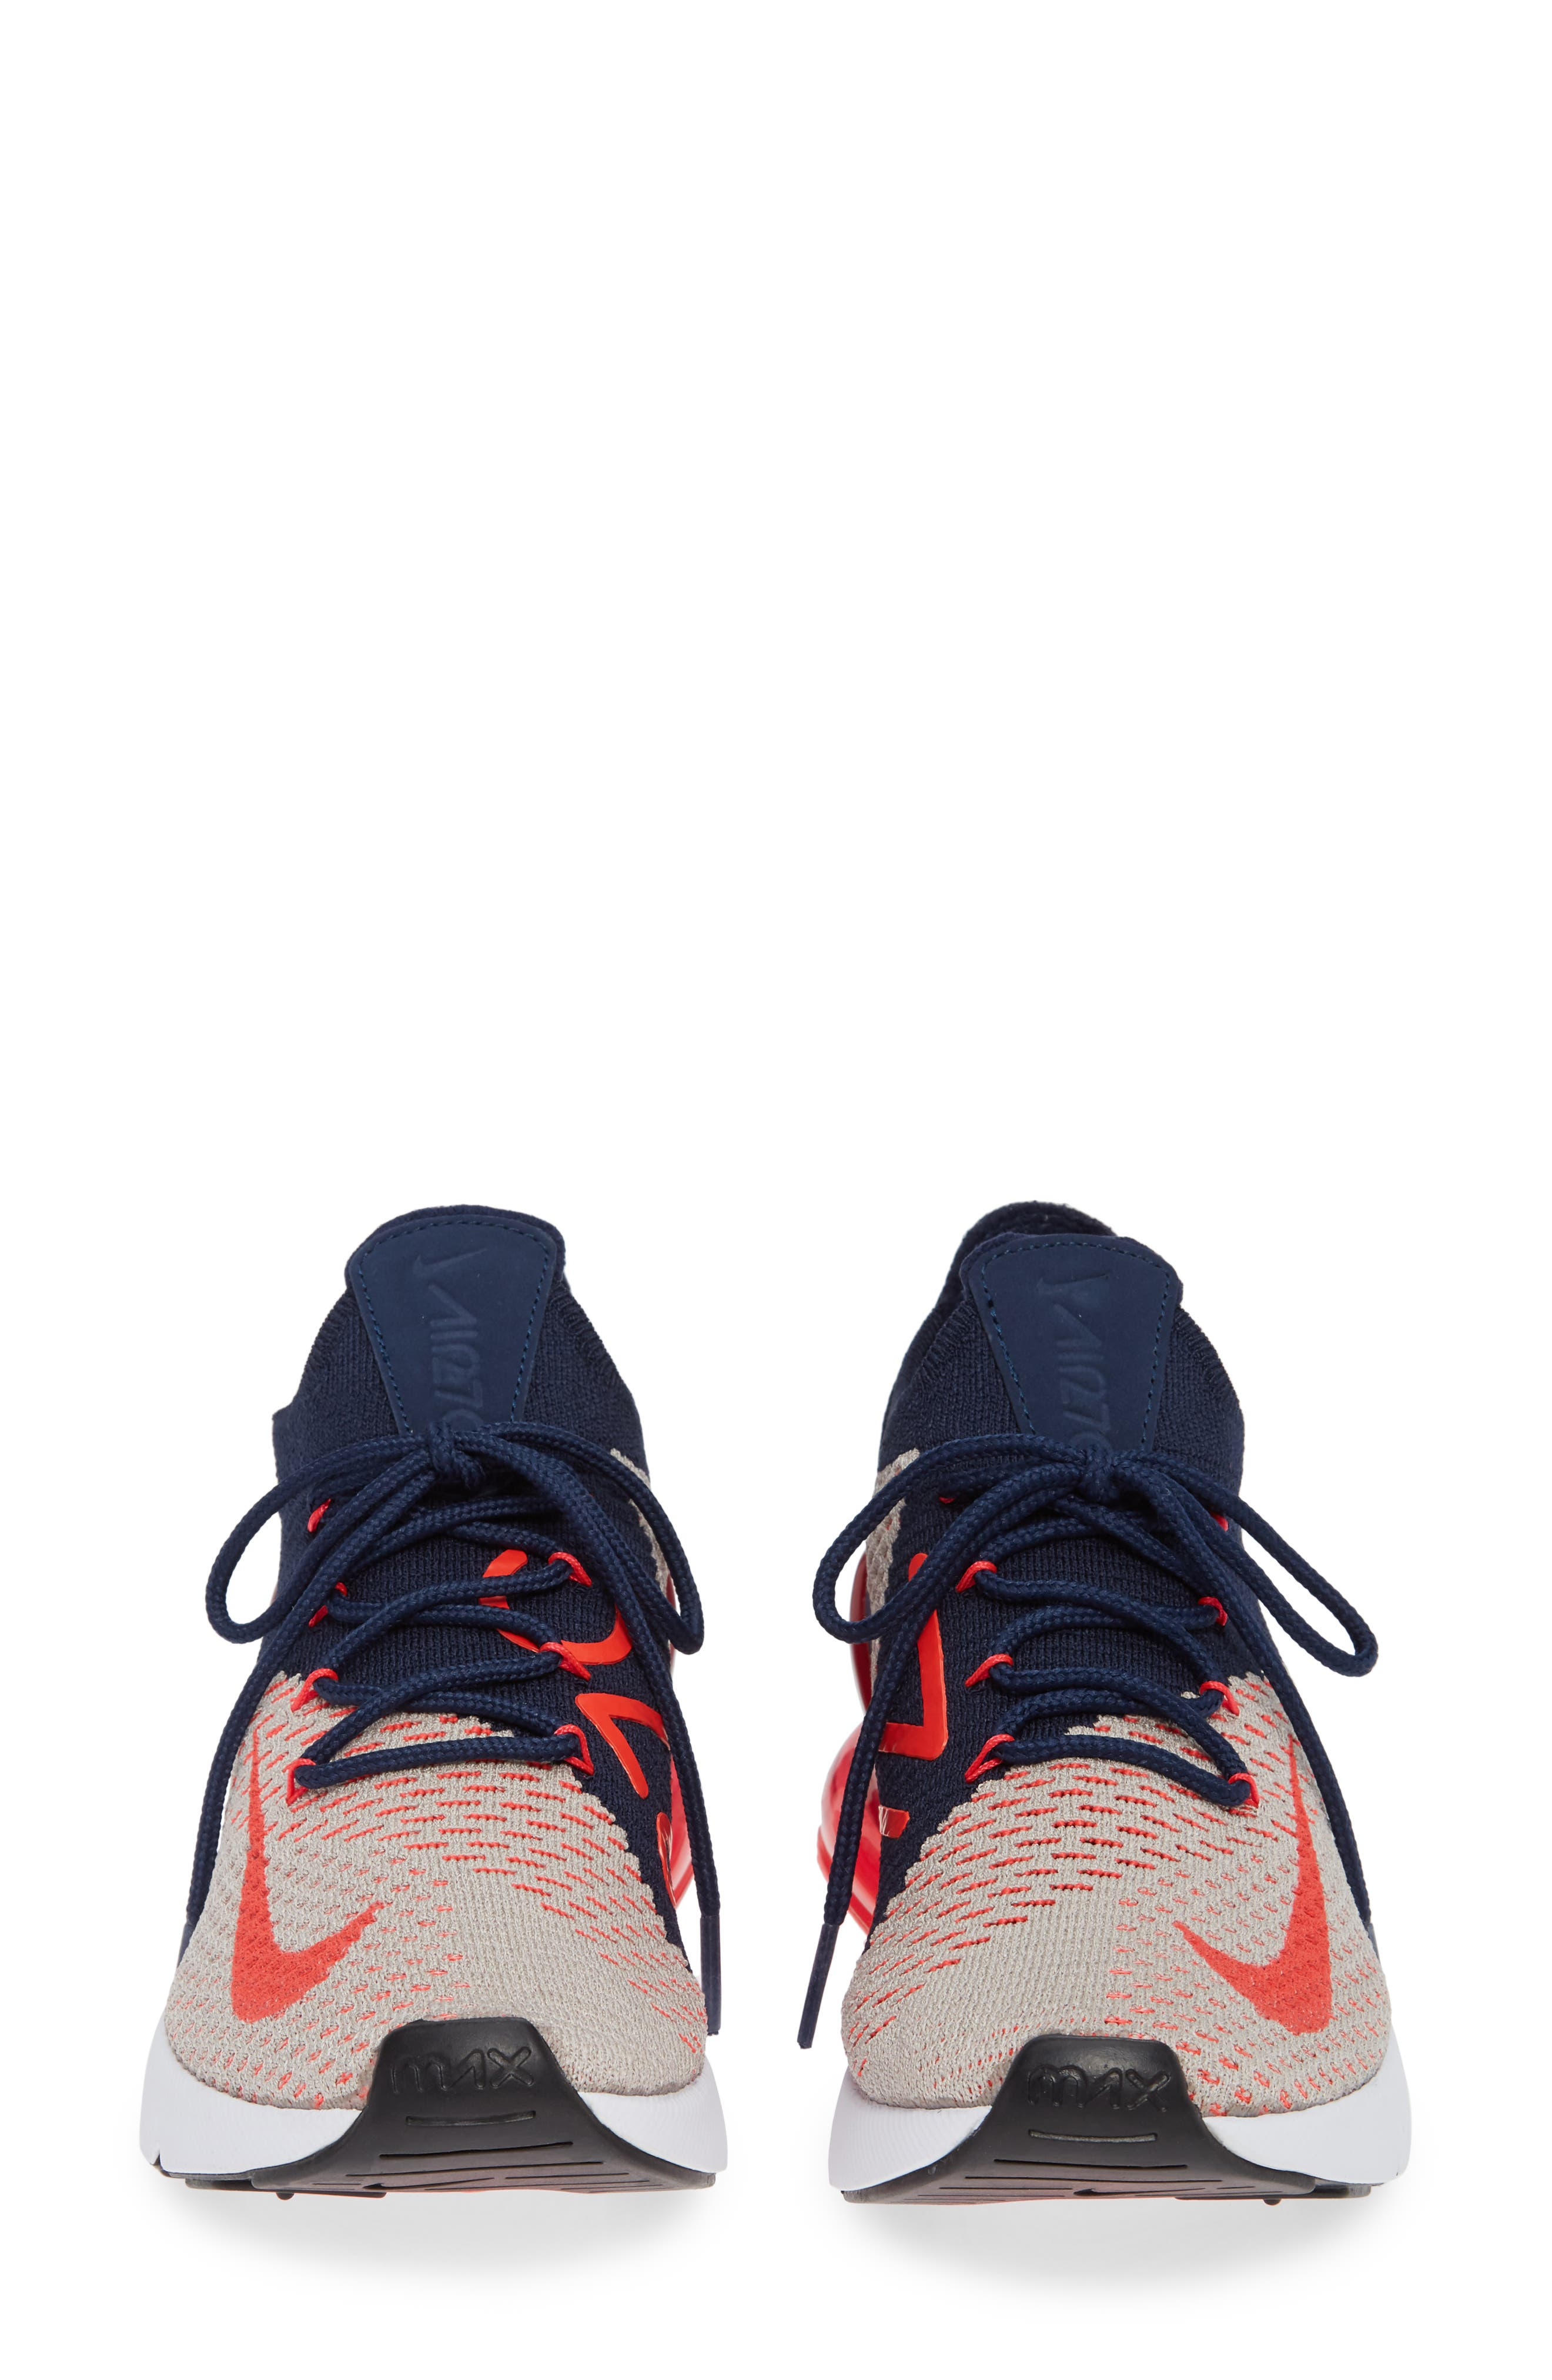 Air Max 270 Flyknit Sneaker,                             Alternate thumbnail 31, color,